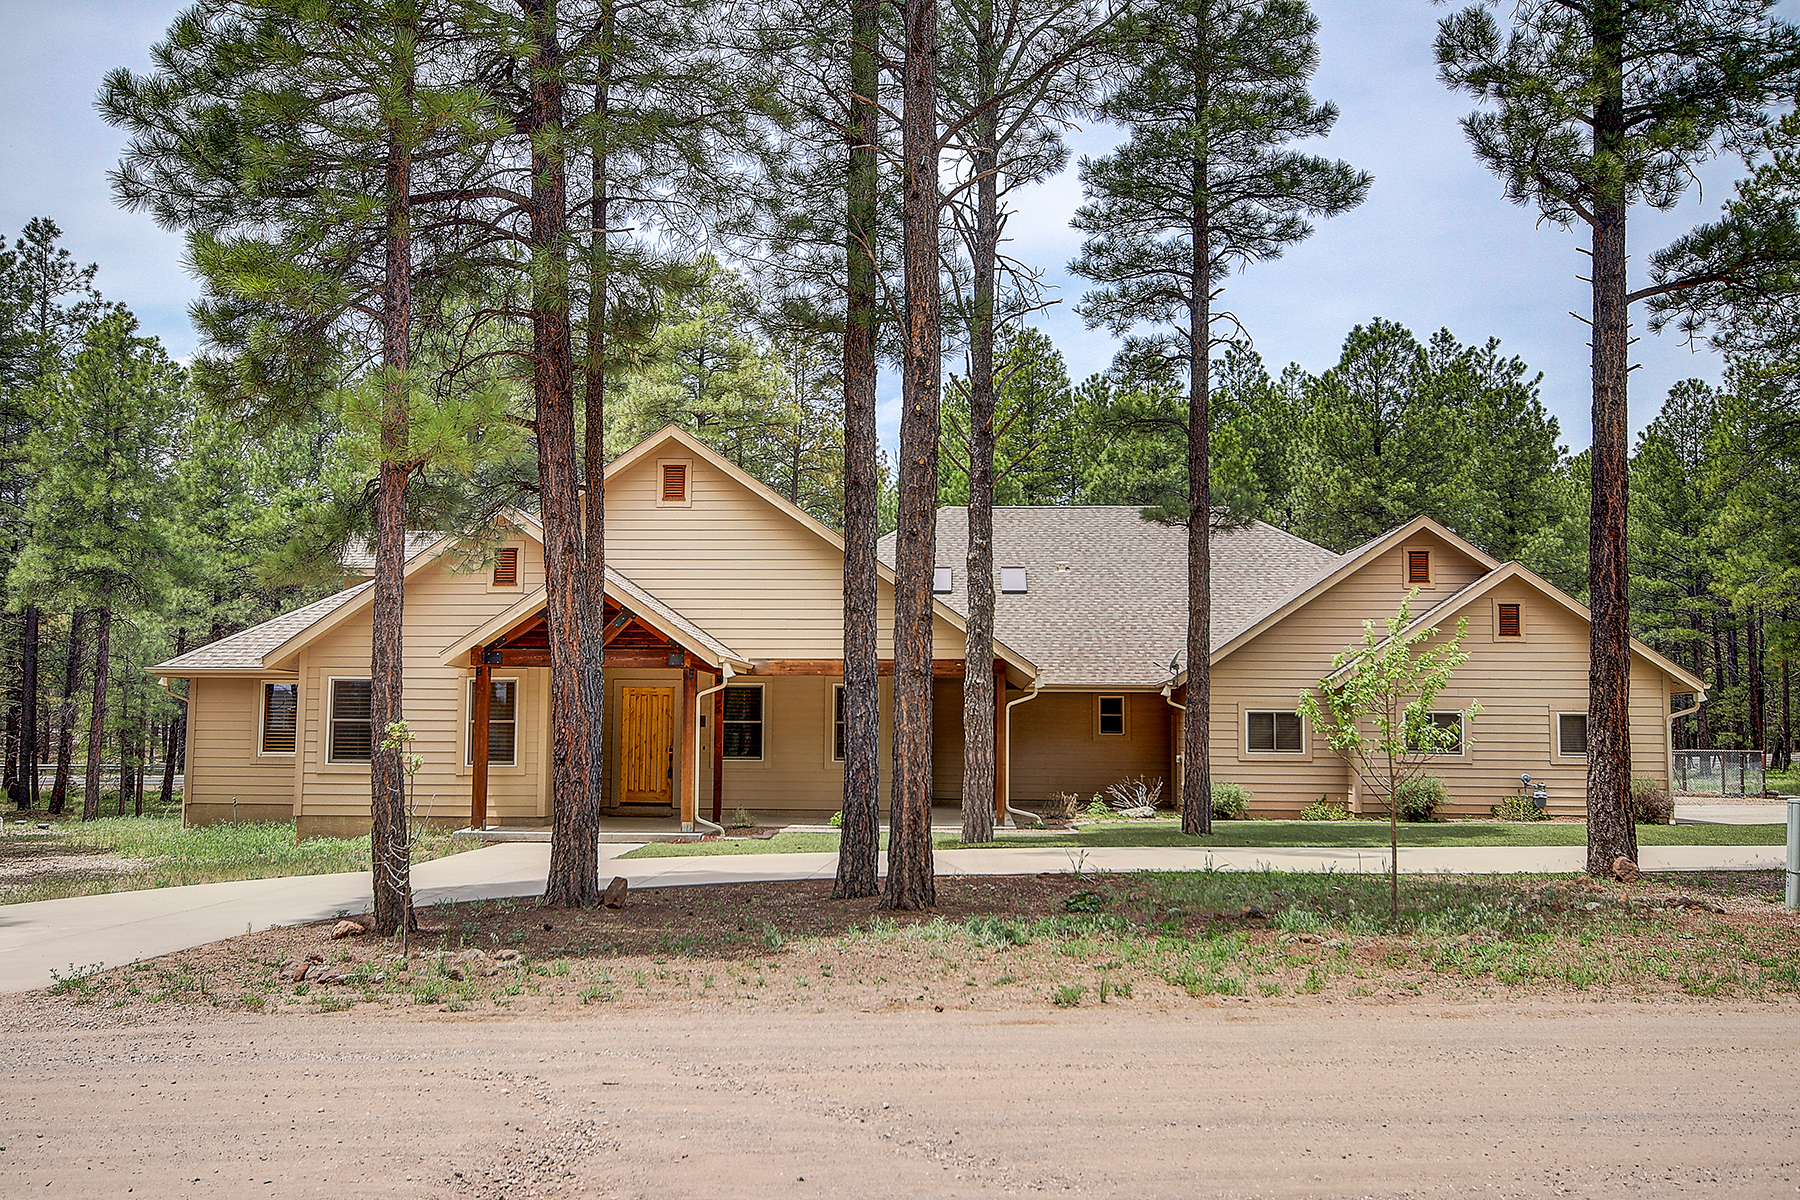 5155 Meadow Vista Court – Sold!